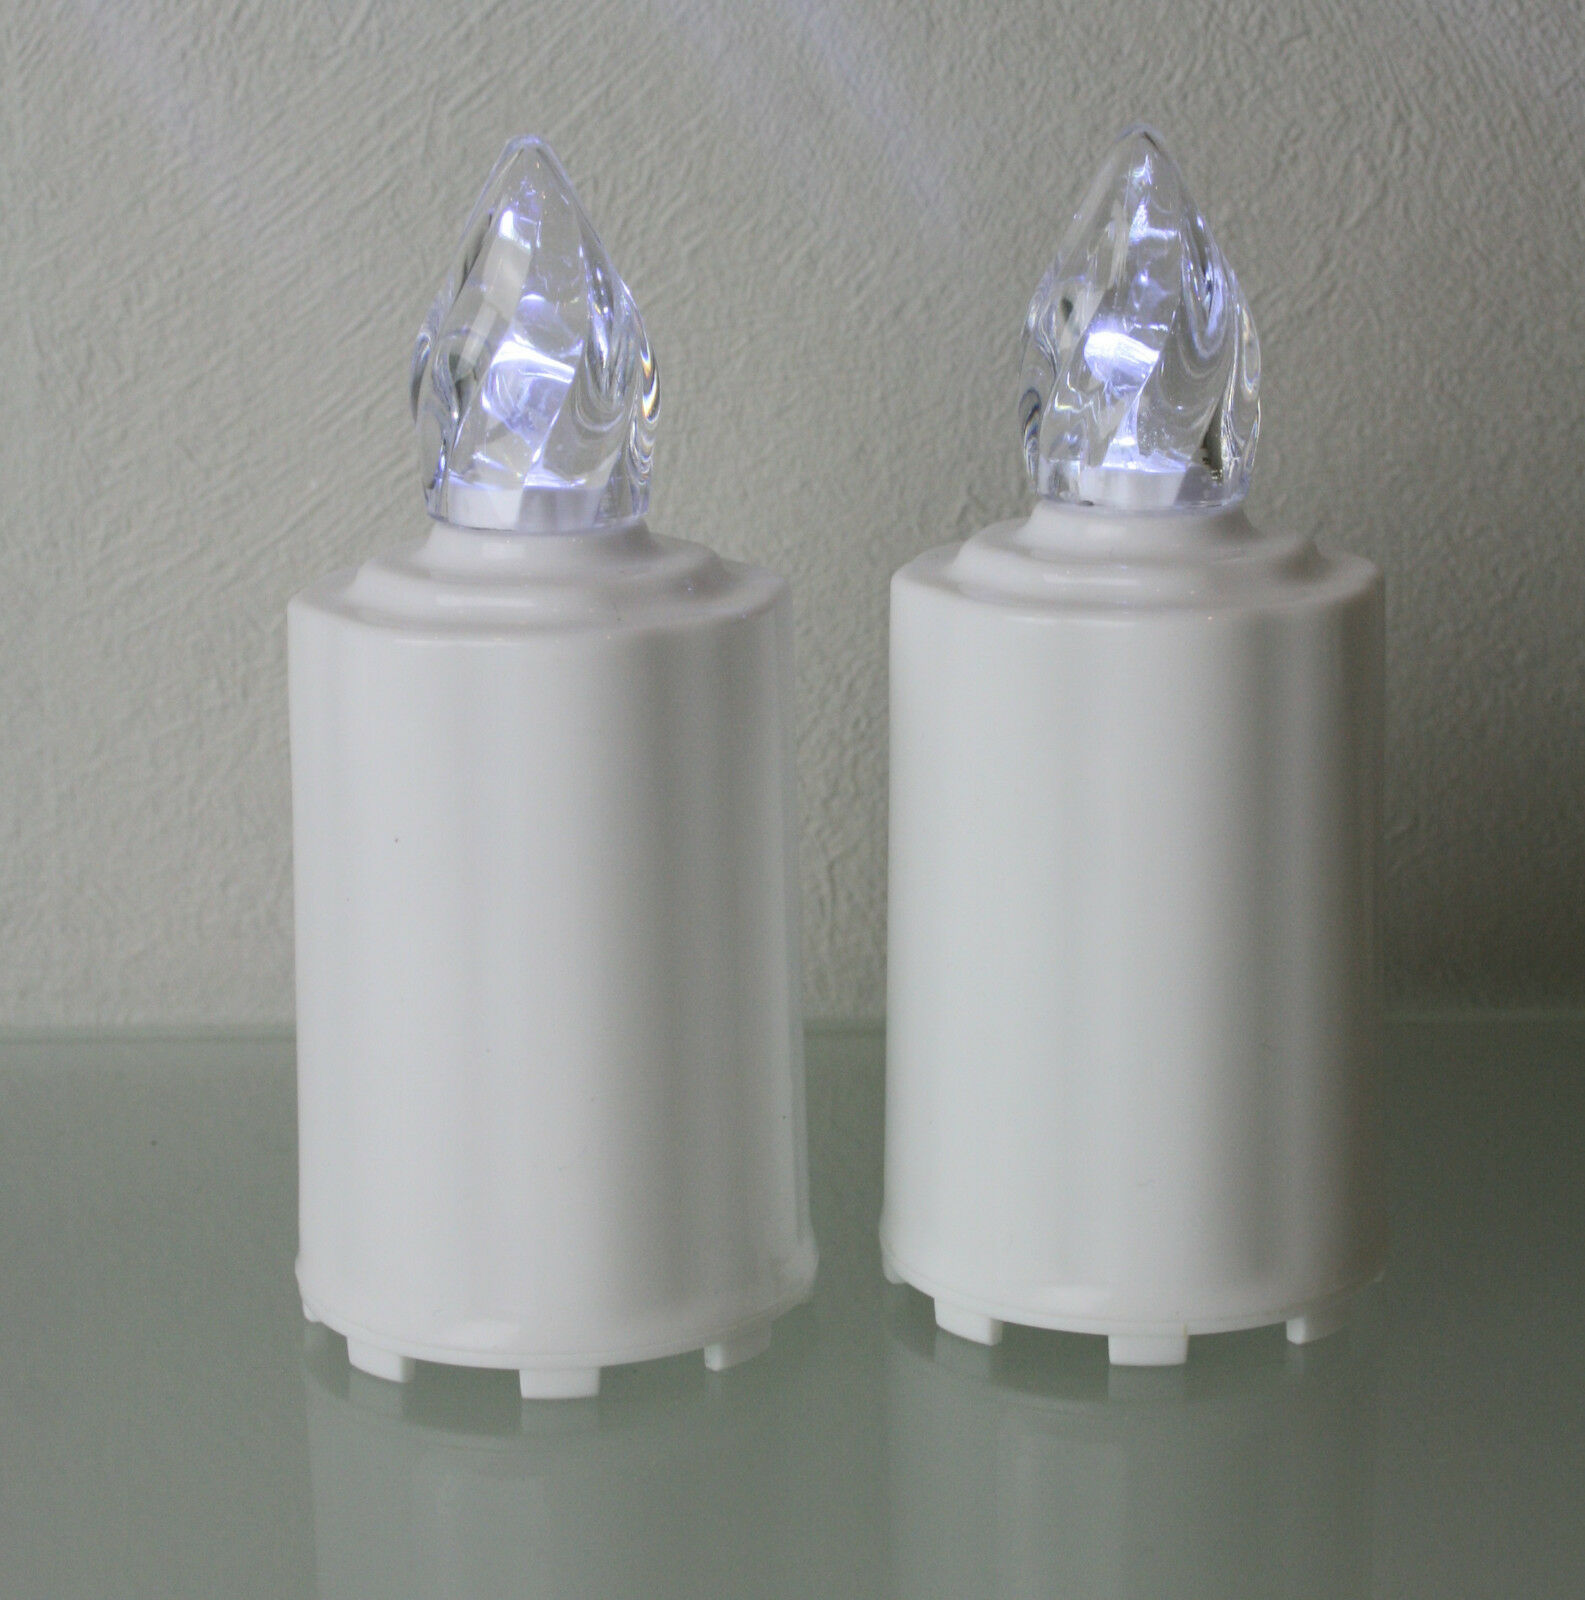 2 LED Elektro Grablicht Kerzen Weiss Grablampe Grabschmuck Batterien Grablichter